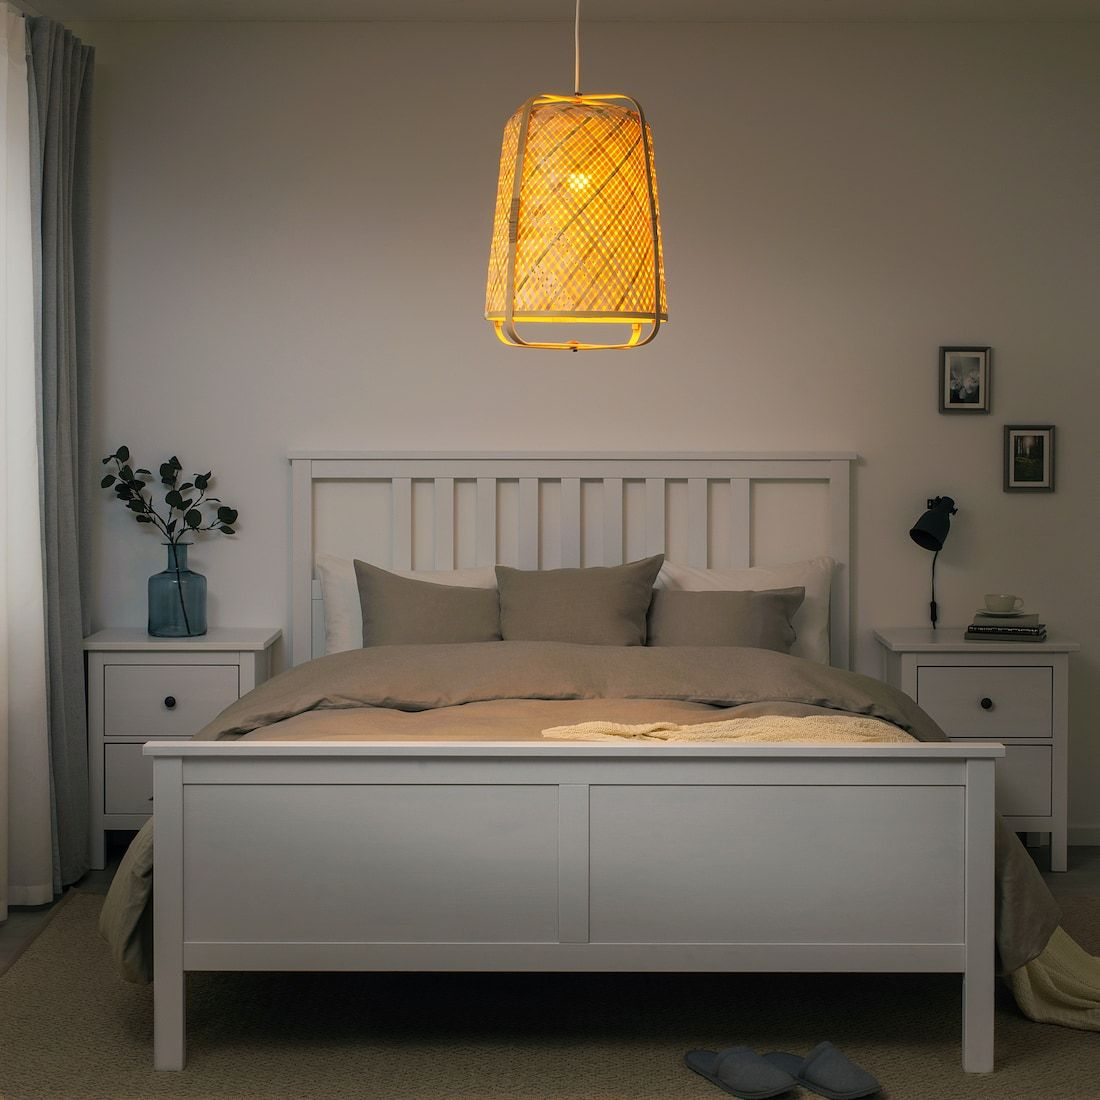 Lampadari Da Camera Matrimoniale Ikea knixhult lampada a sospensione - bambù | idee ikea, lampade